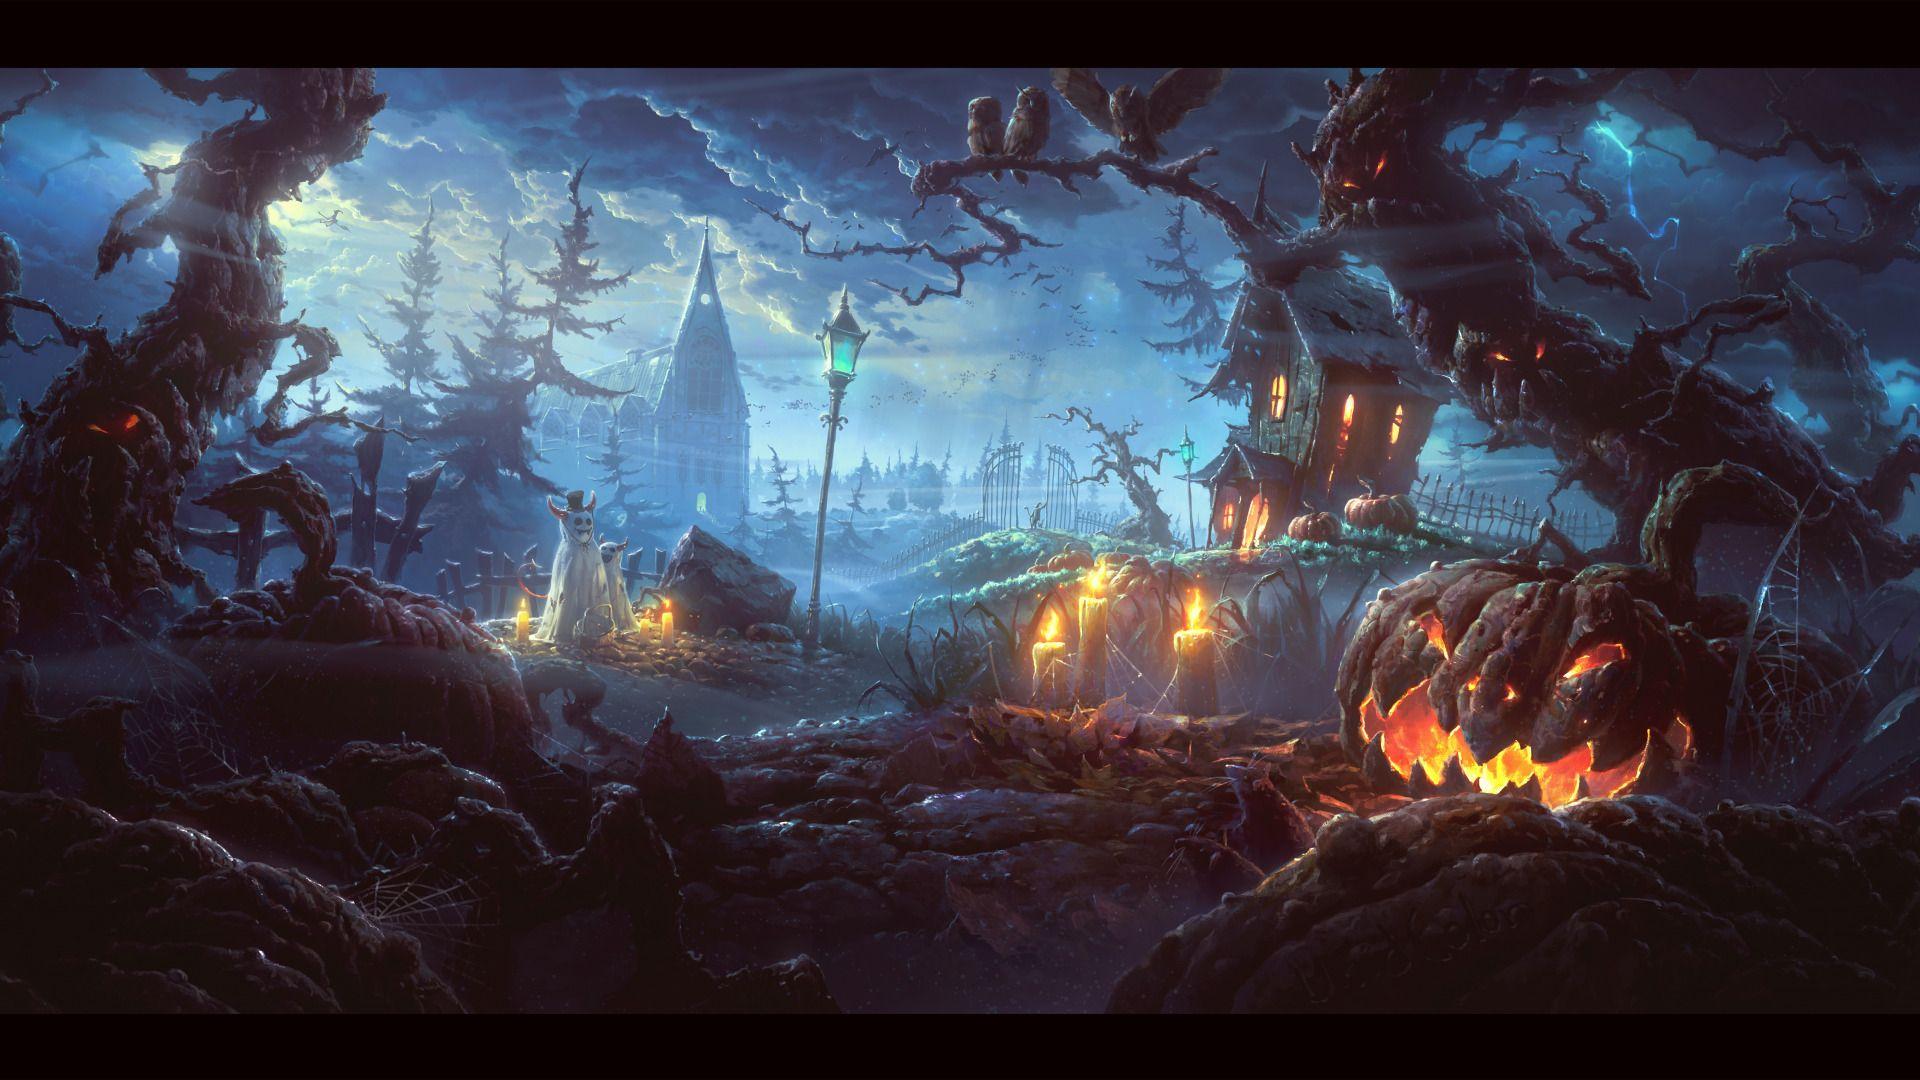 Halloween Landscapes, Halloween 2020 Image